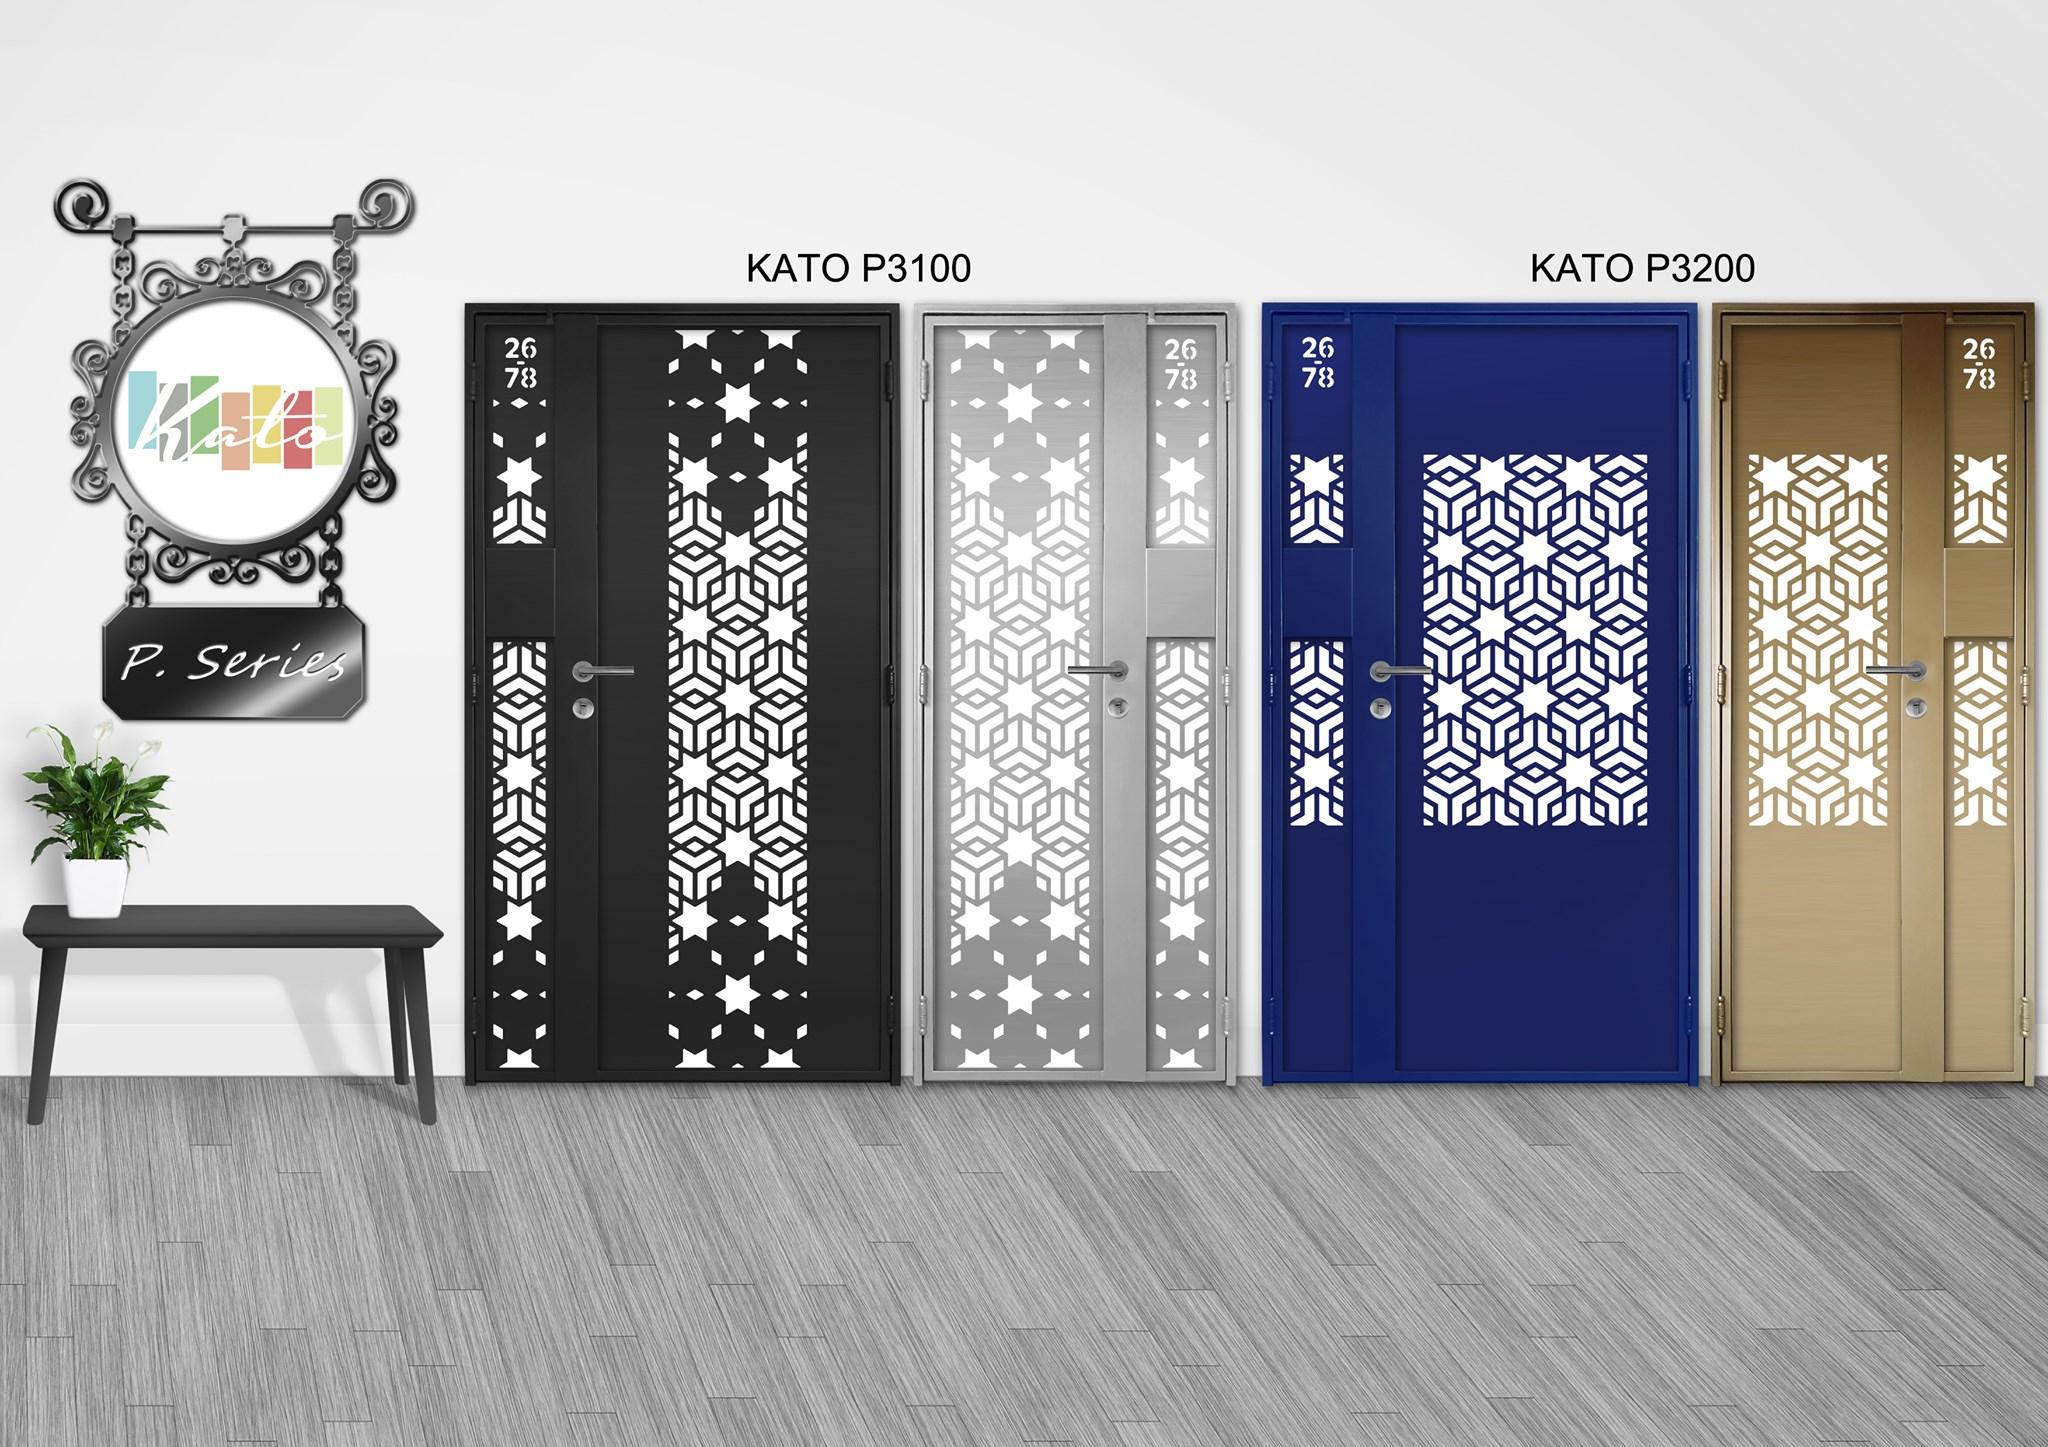 Digital Lock Door   2021 New Kato Laser Cut Design (Latest Trend)